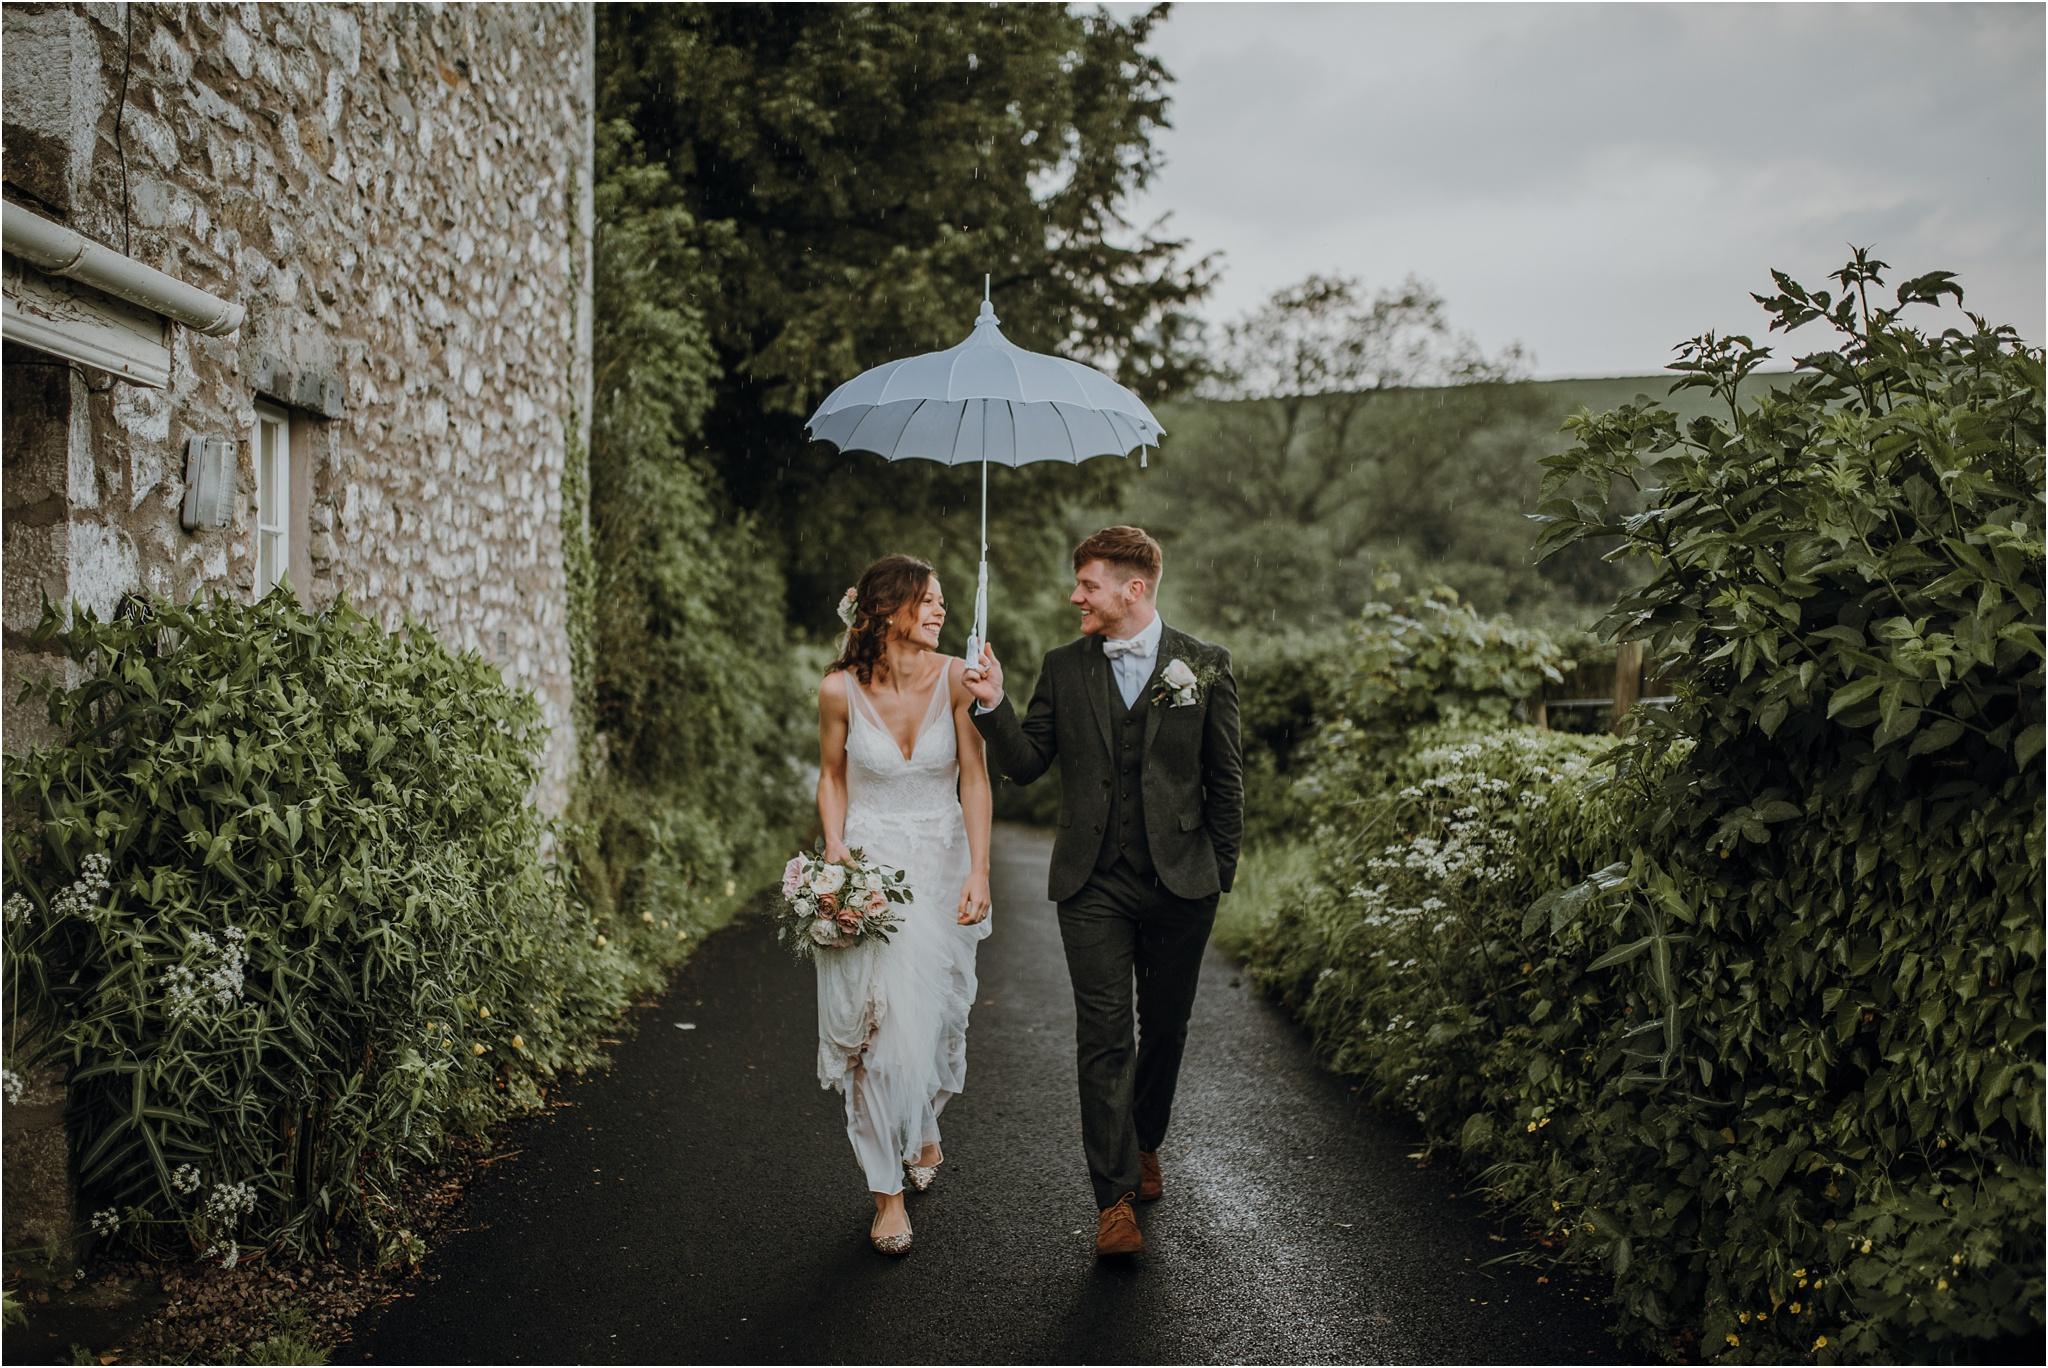 Outdoor-country-wedding-Edinburgh-photographer__0215.jpg